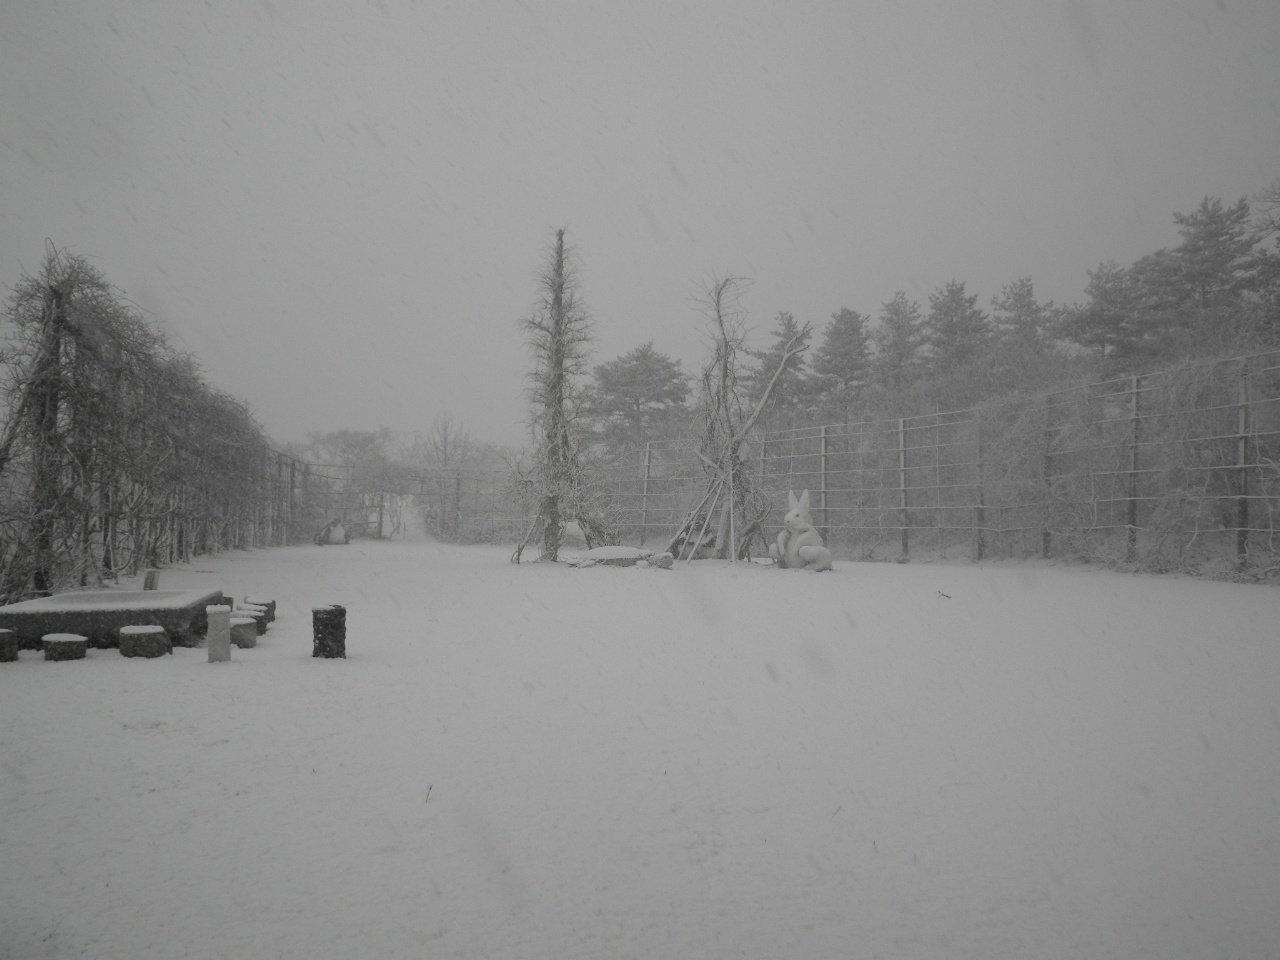 夢の森・催事広場・冬